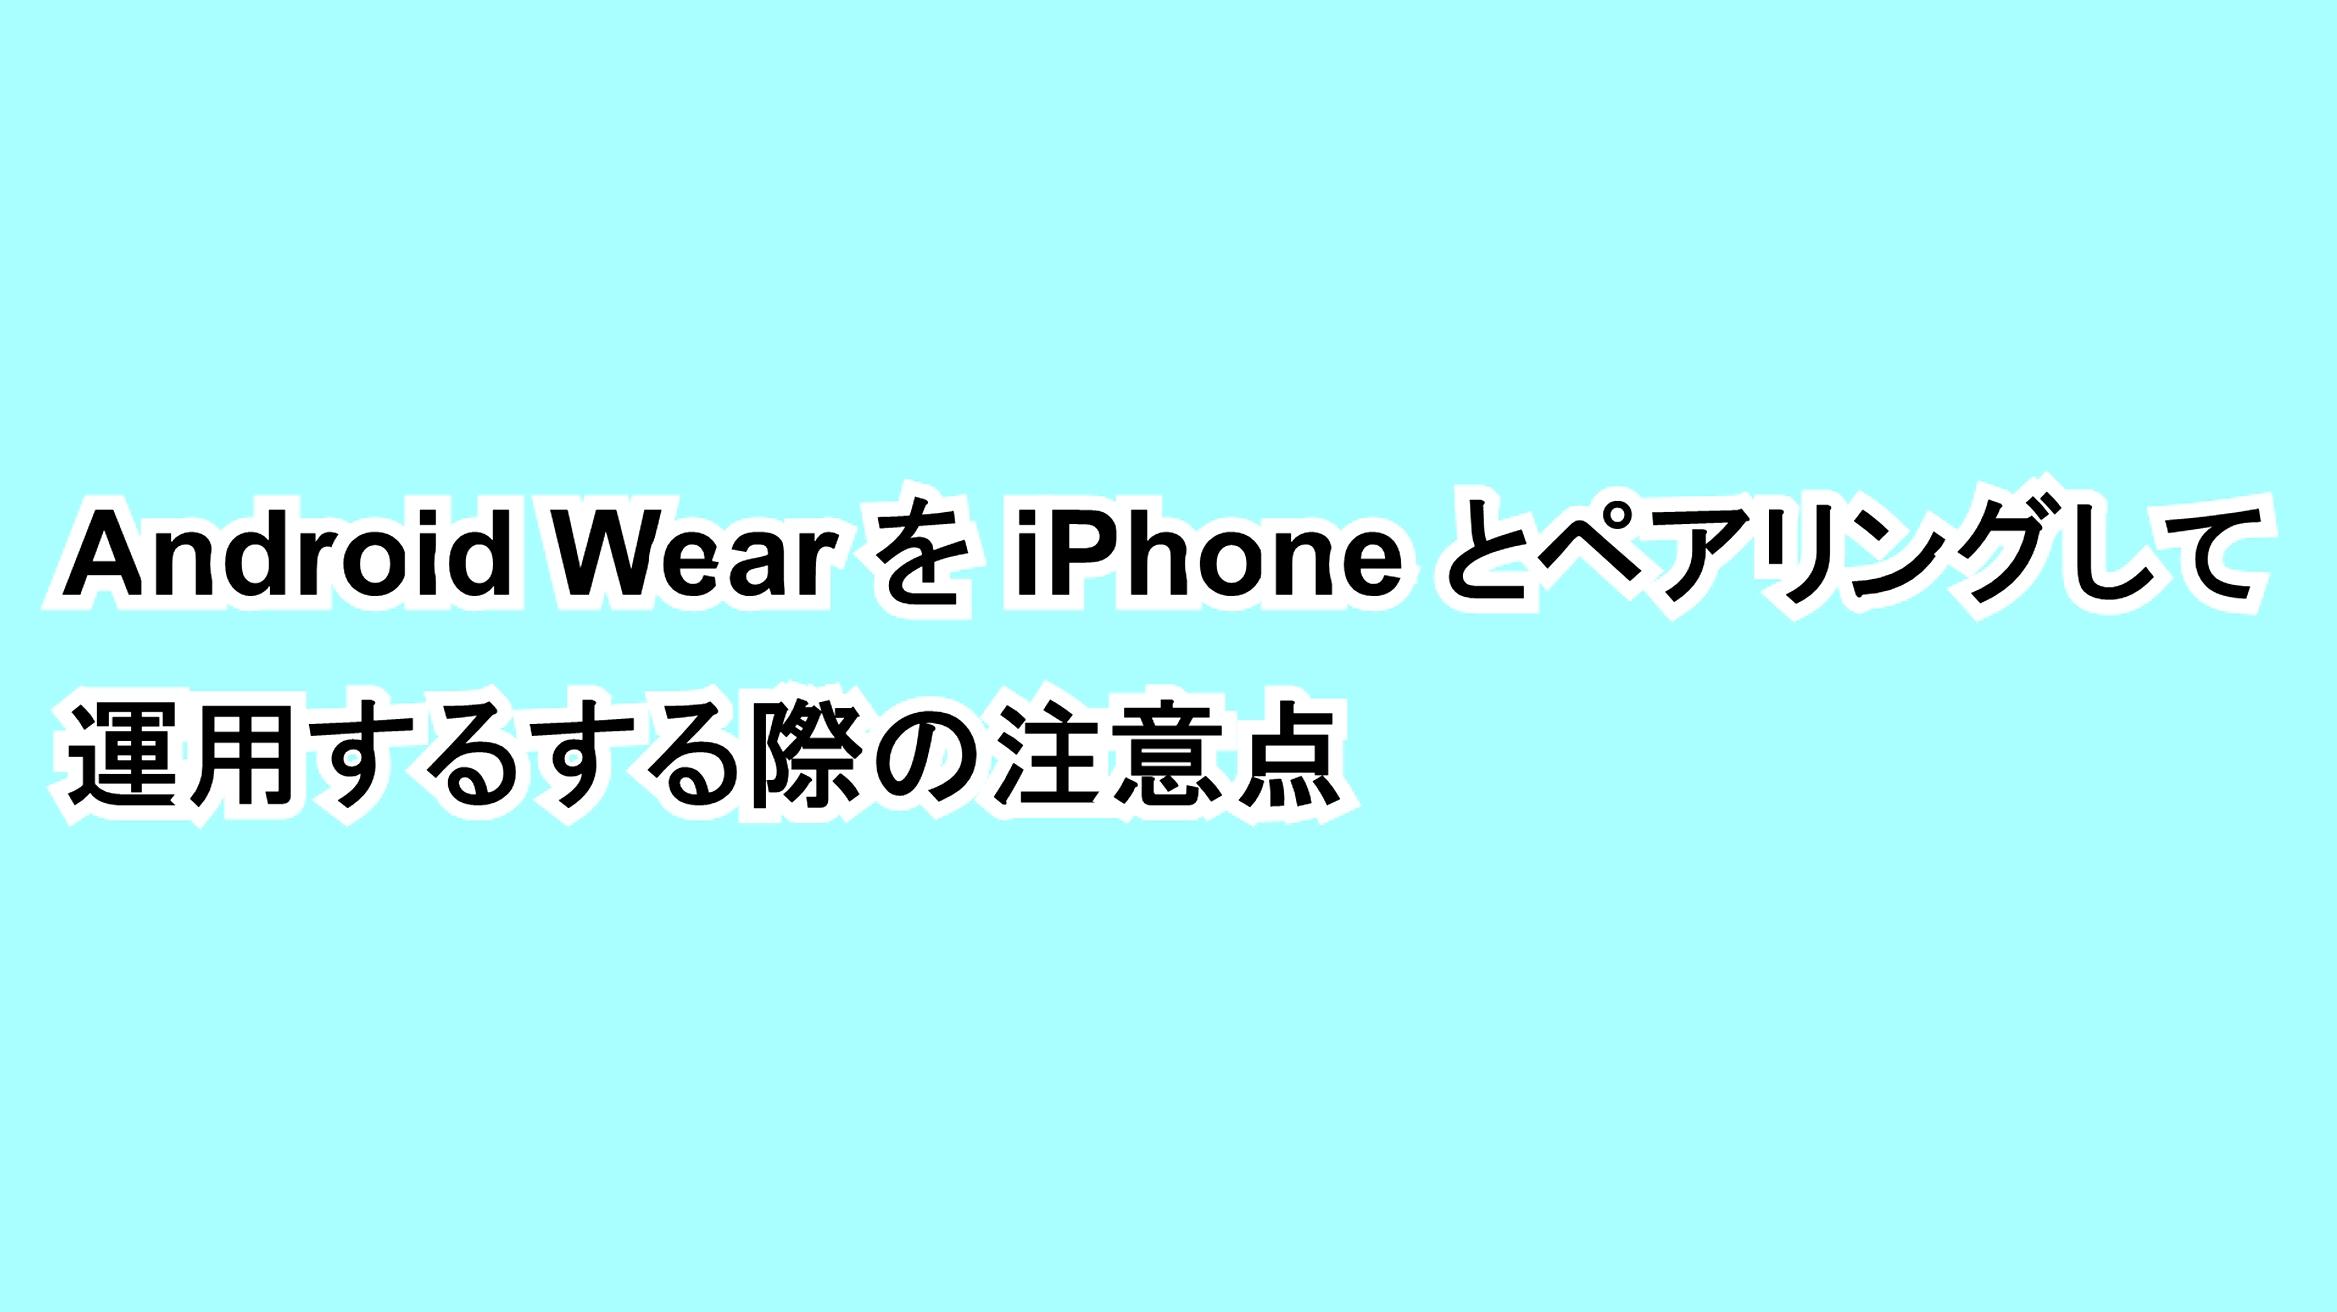 Android WearをiPhoneとペアリングして運用する際の注意点